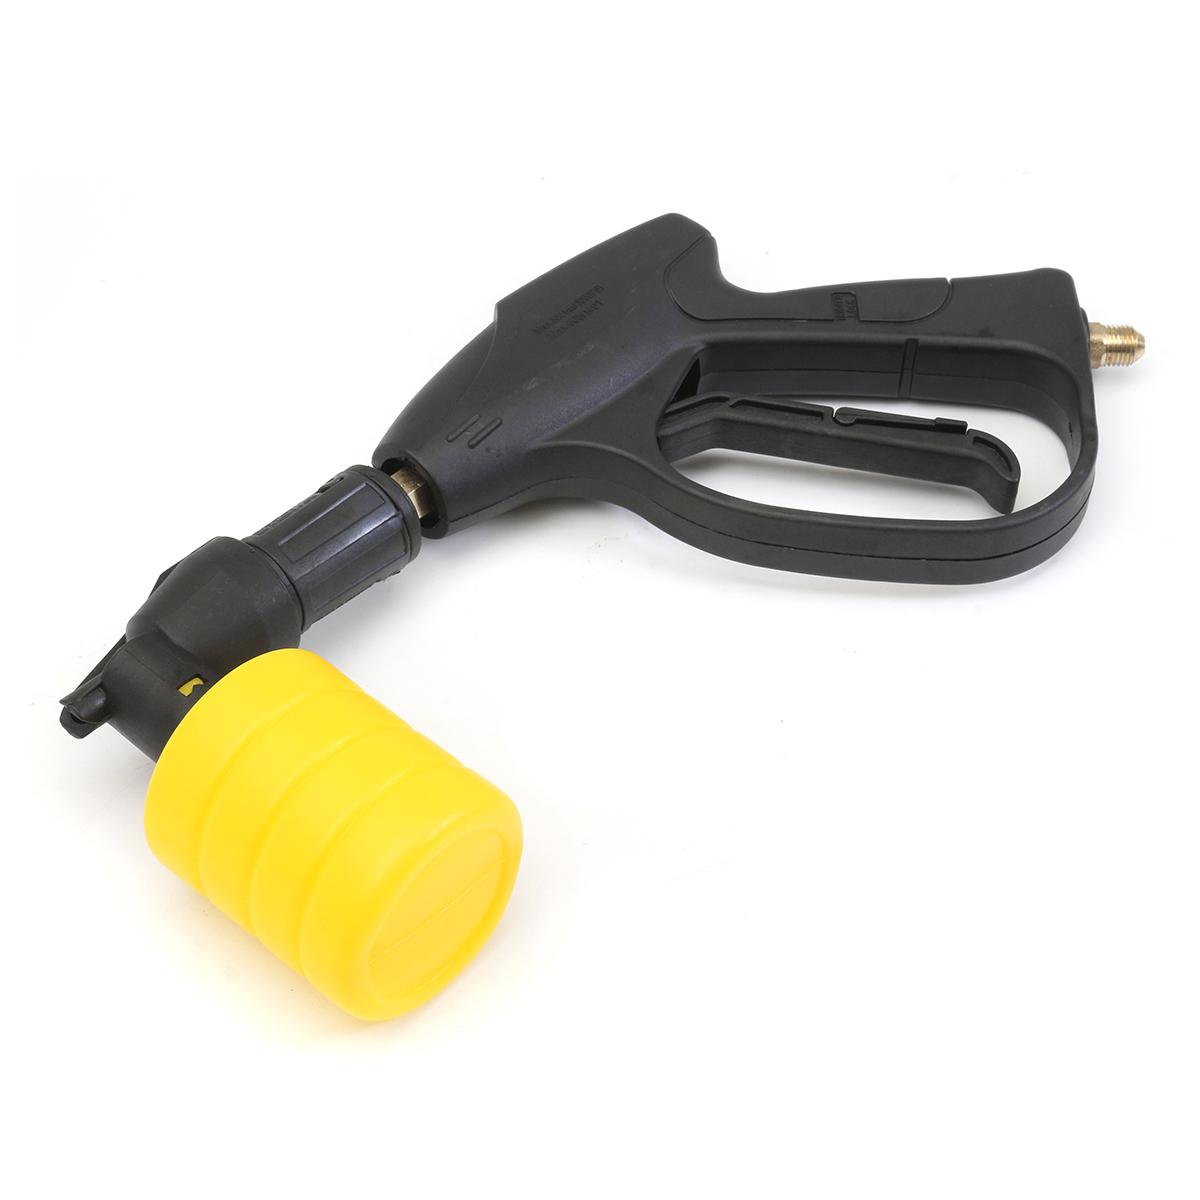 Portable High Pressure Electric Washer Wash Gun Wash Pump Set Yellow